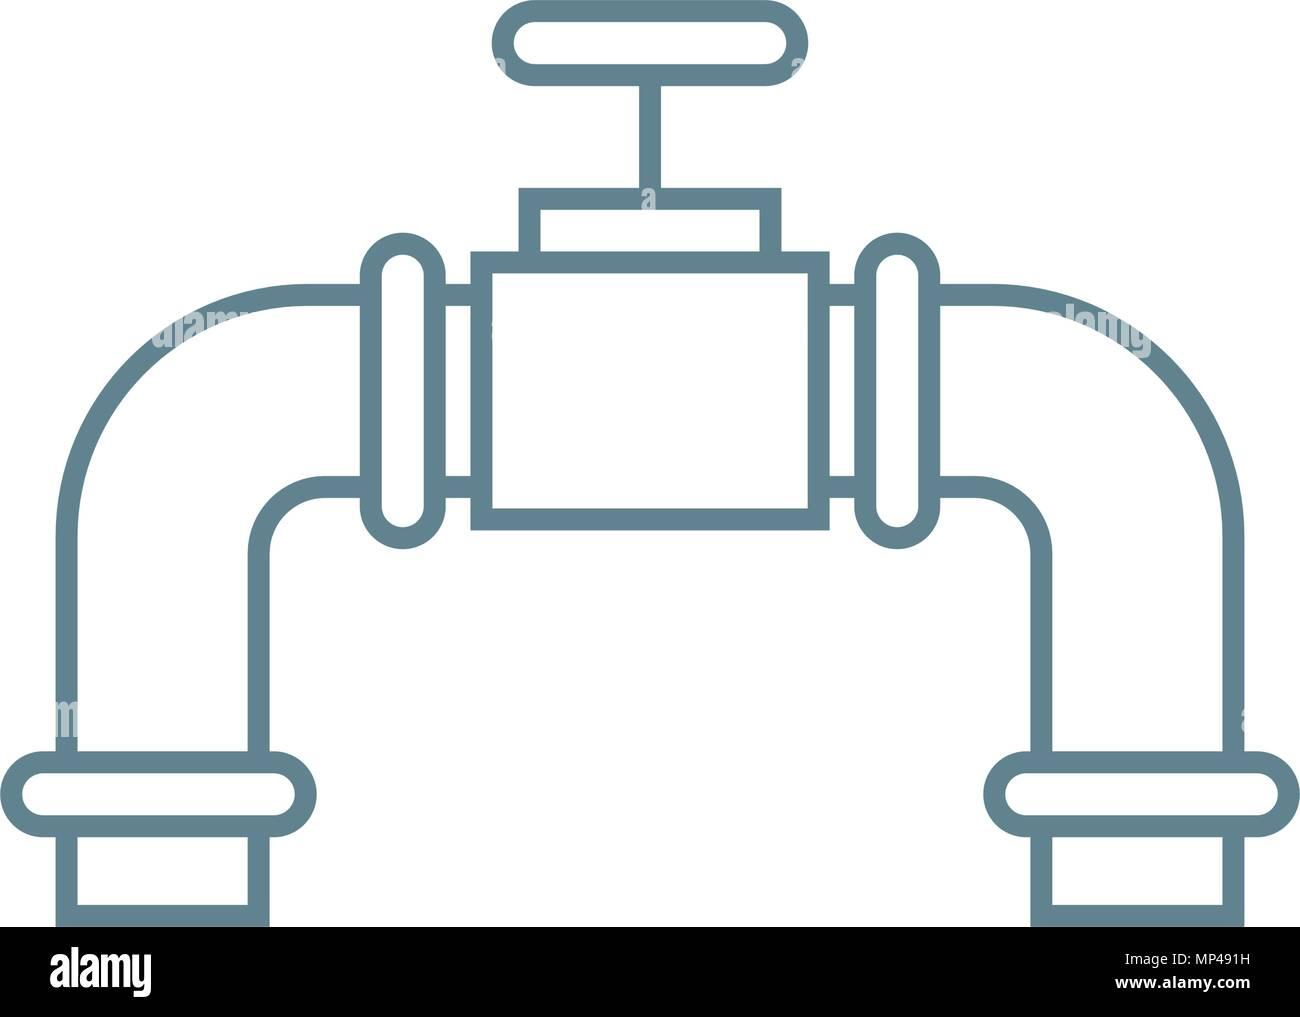 Domestic Hot Water Boiler Stock Photos & Domestic Hot Water Boiler ...